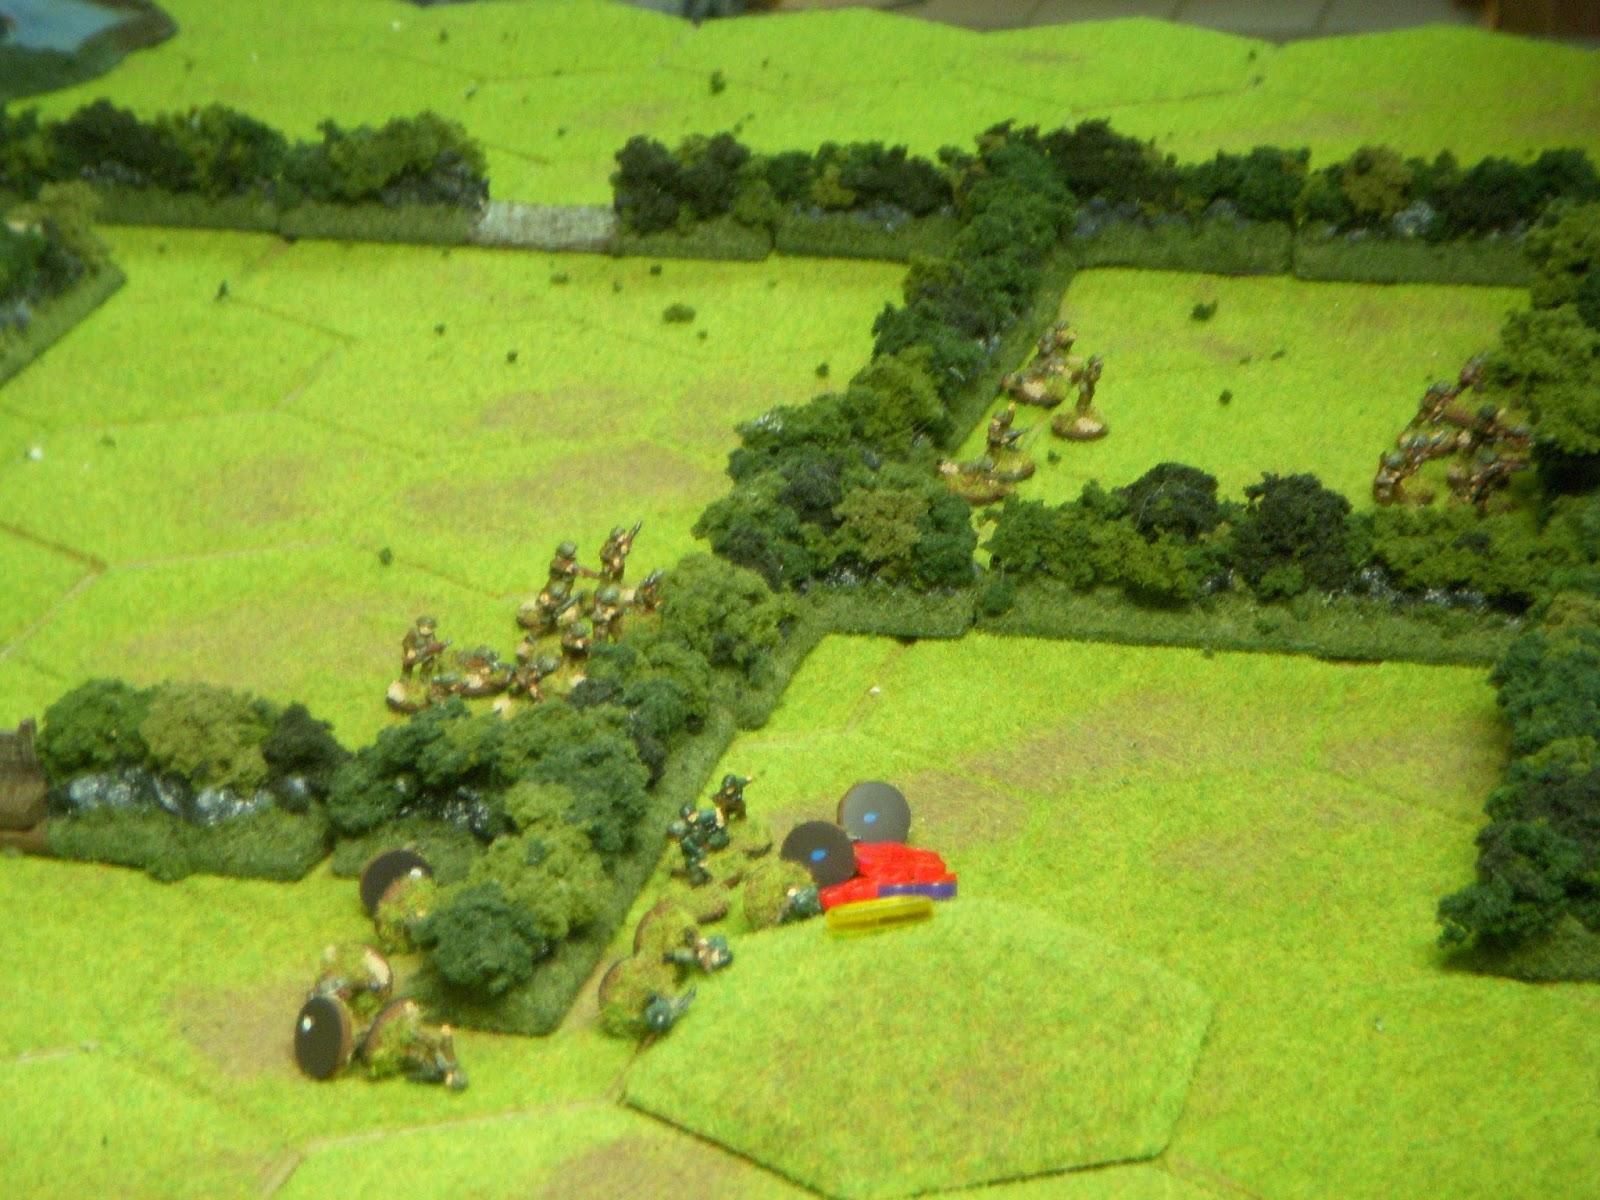 Revenge: 1st platoon gets the ambushers in a crossfire